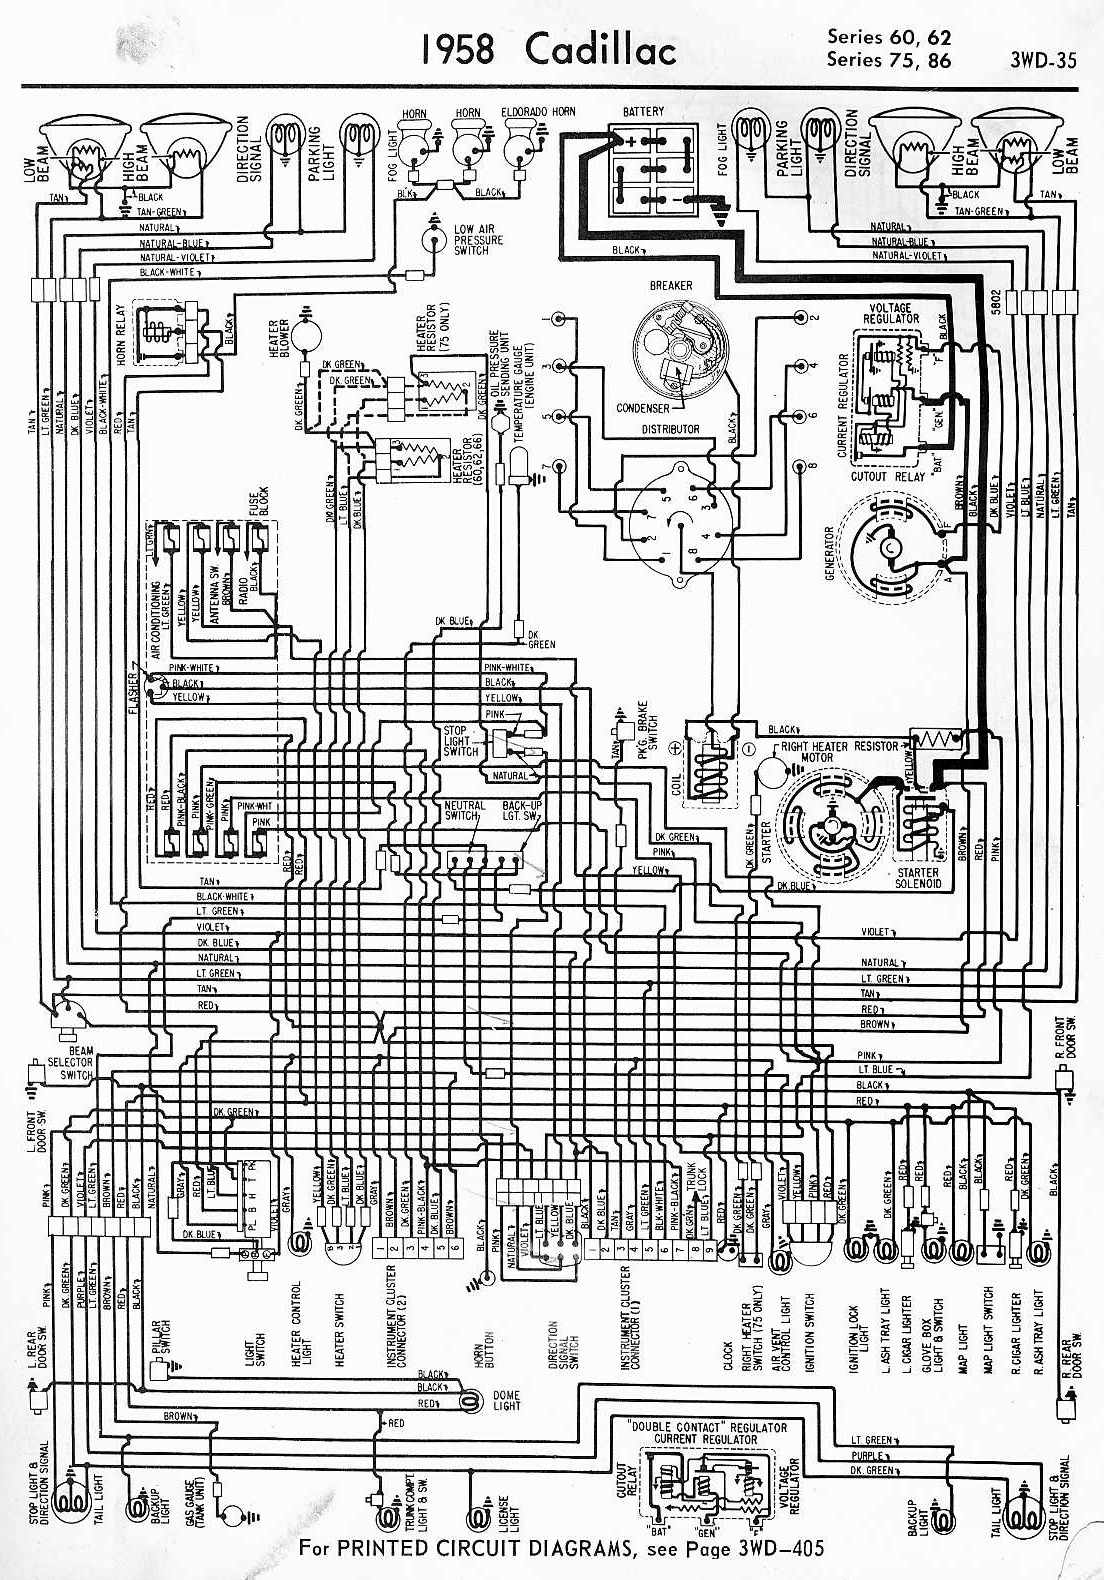 CADILLAC - Car PDF Manual, Wiring Diagram & Fault Codes DTC